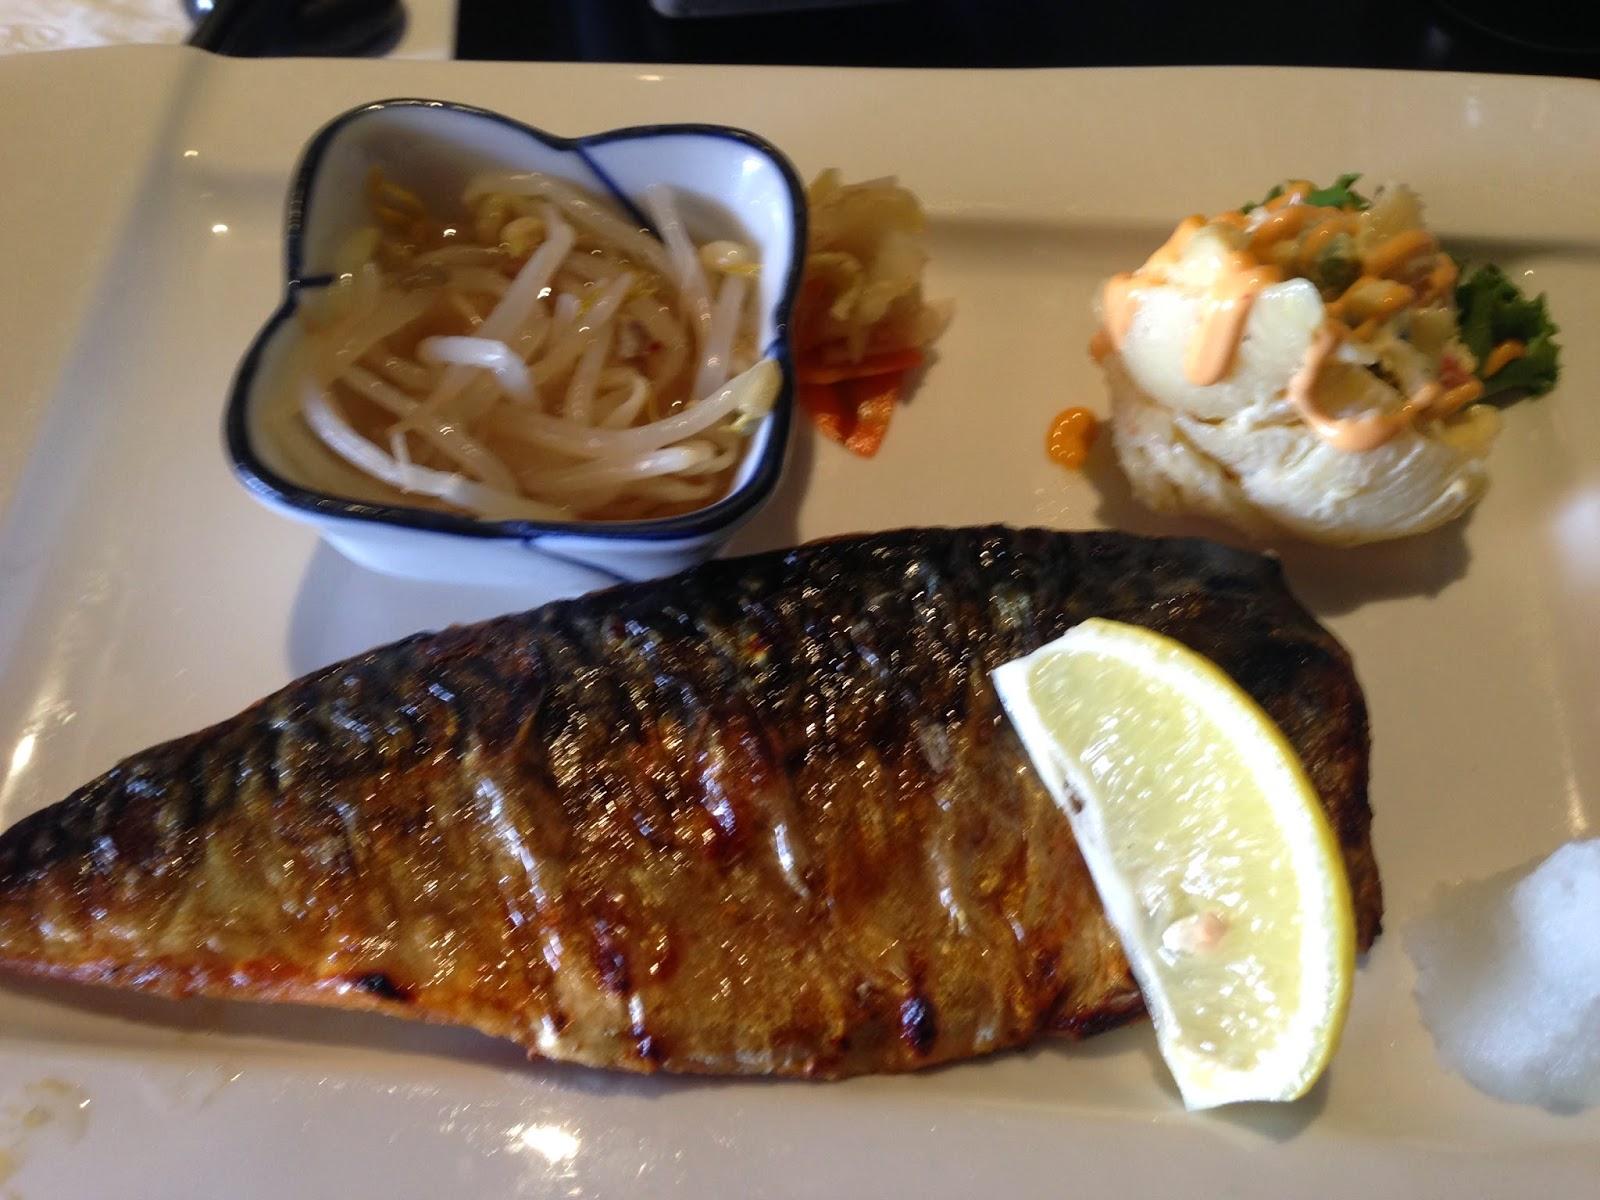 RESTAURANT REVIEW # 8-Taki Sushi, Niagara Falls   Turistang Barat